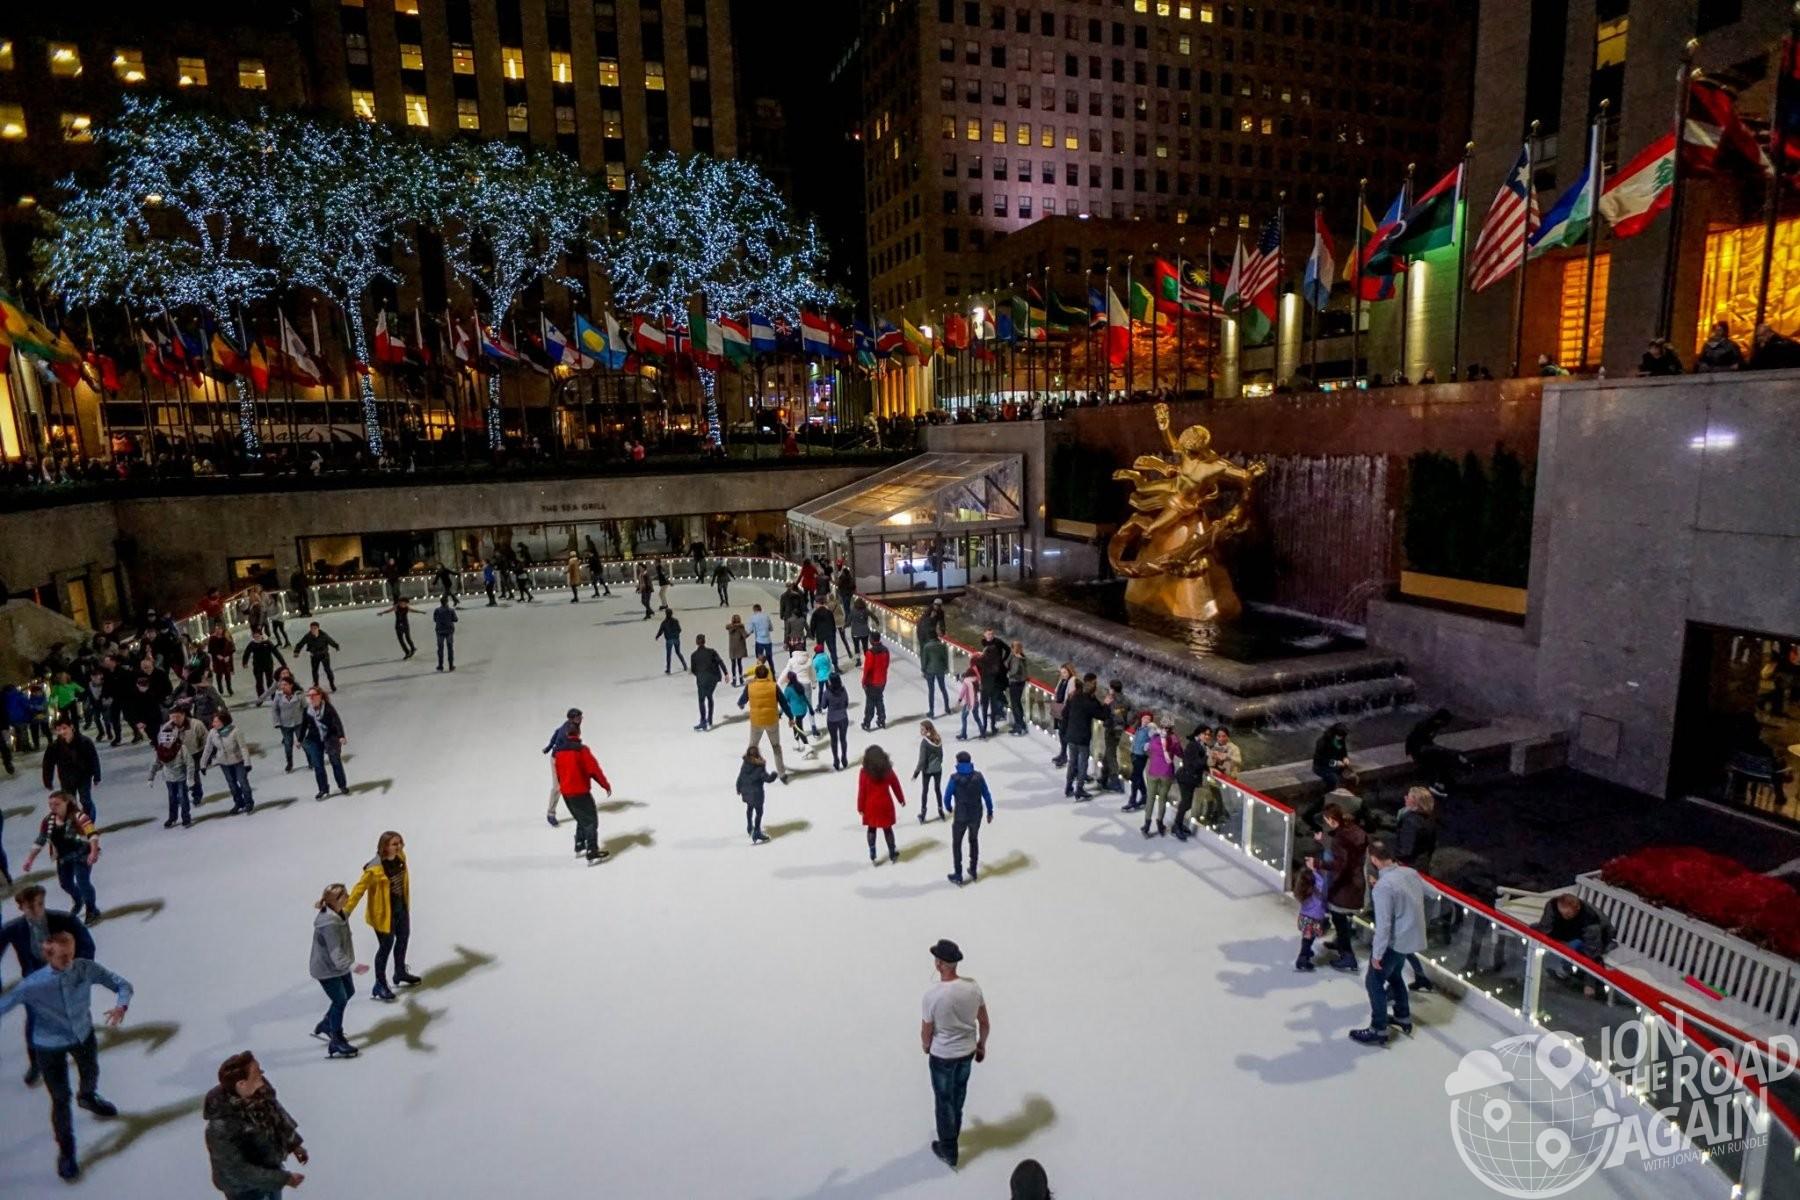 Ice Skating Rink and Rockefeller Center